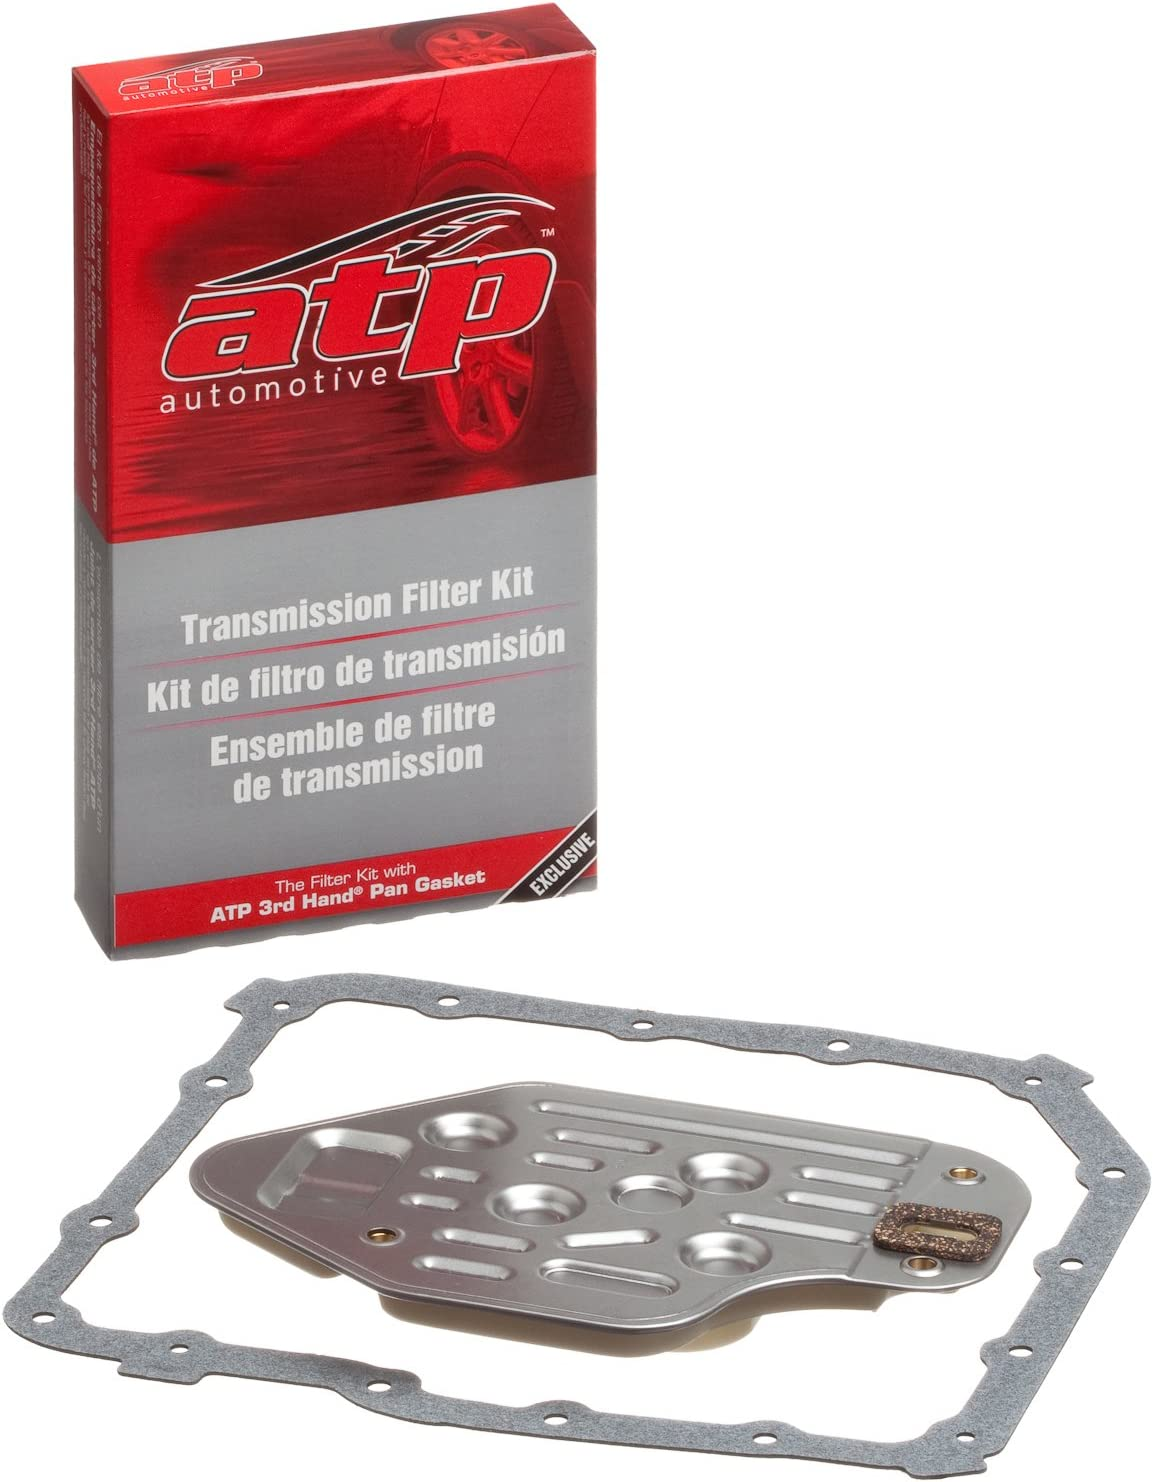 ATP TF-147 Automatic Transmission Filter Kit